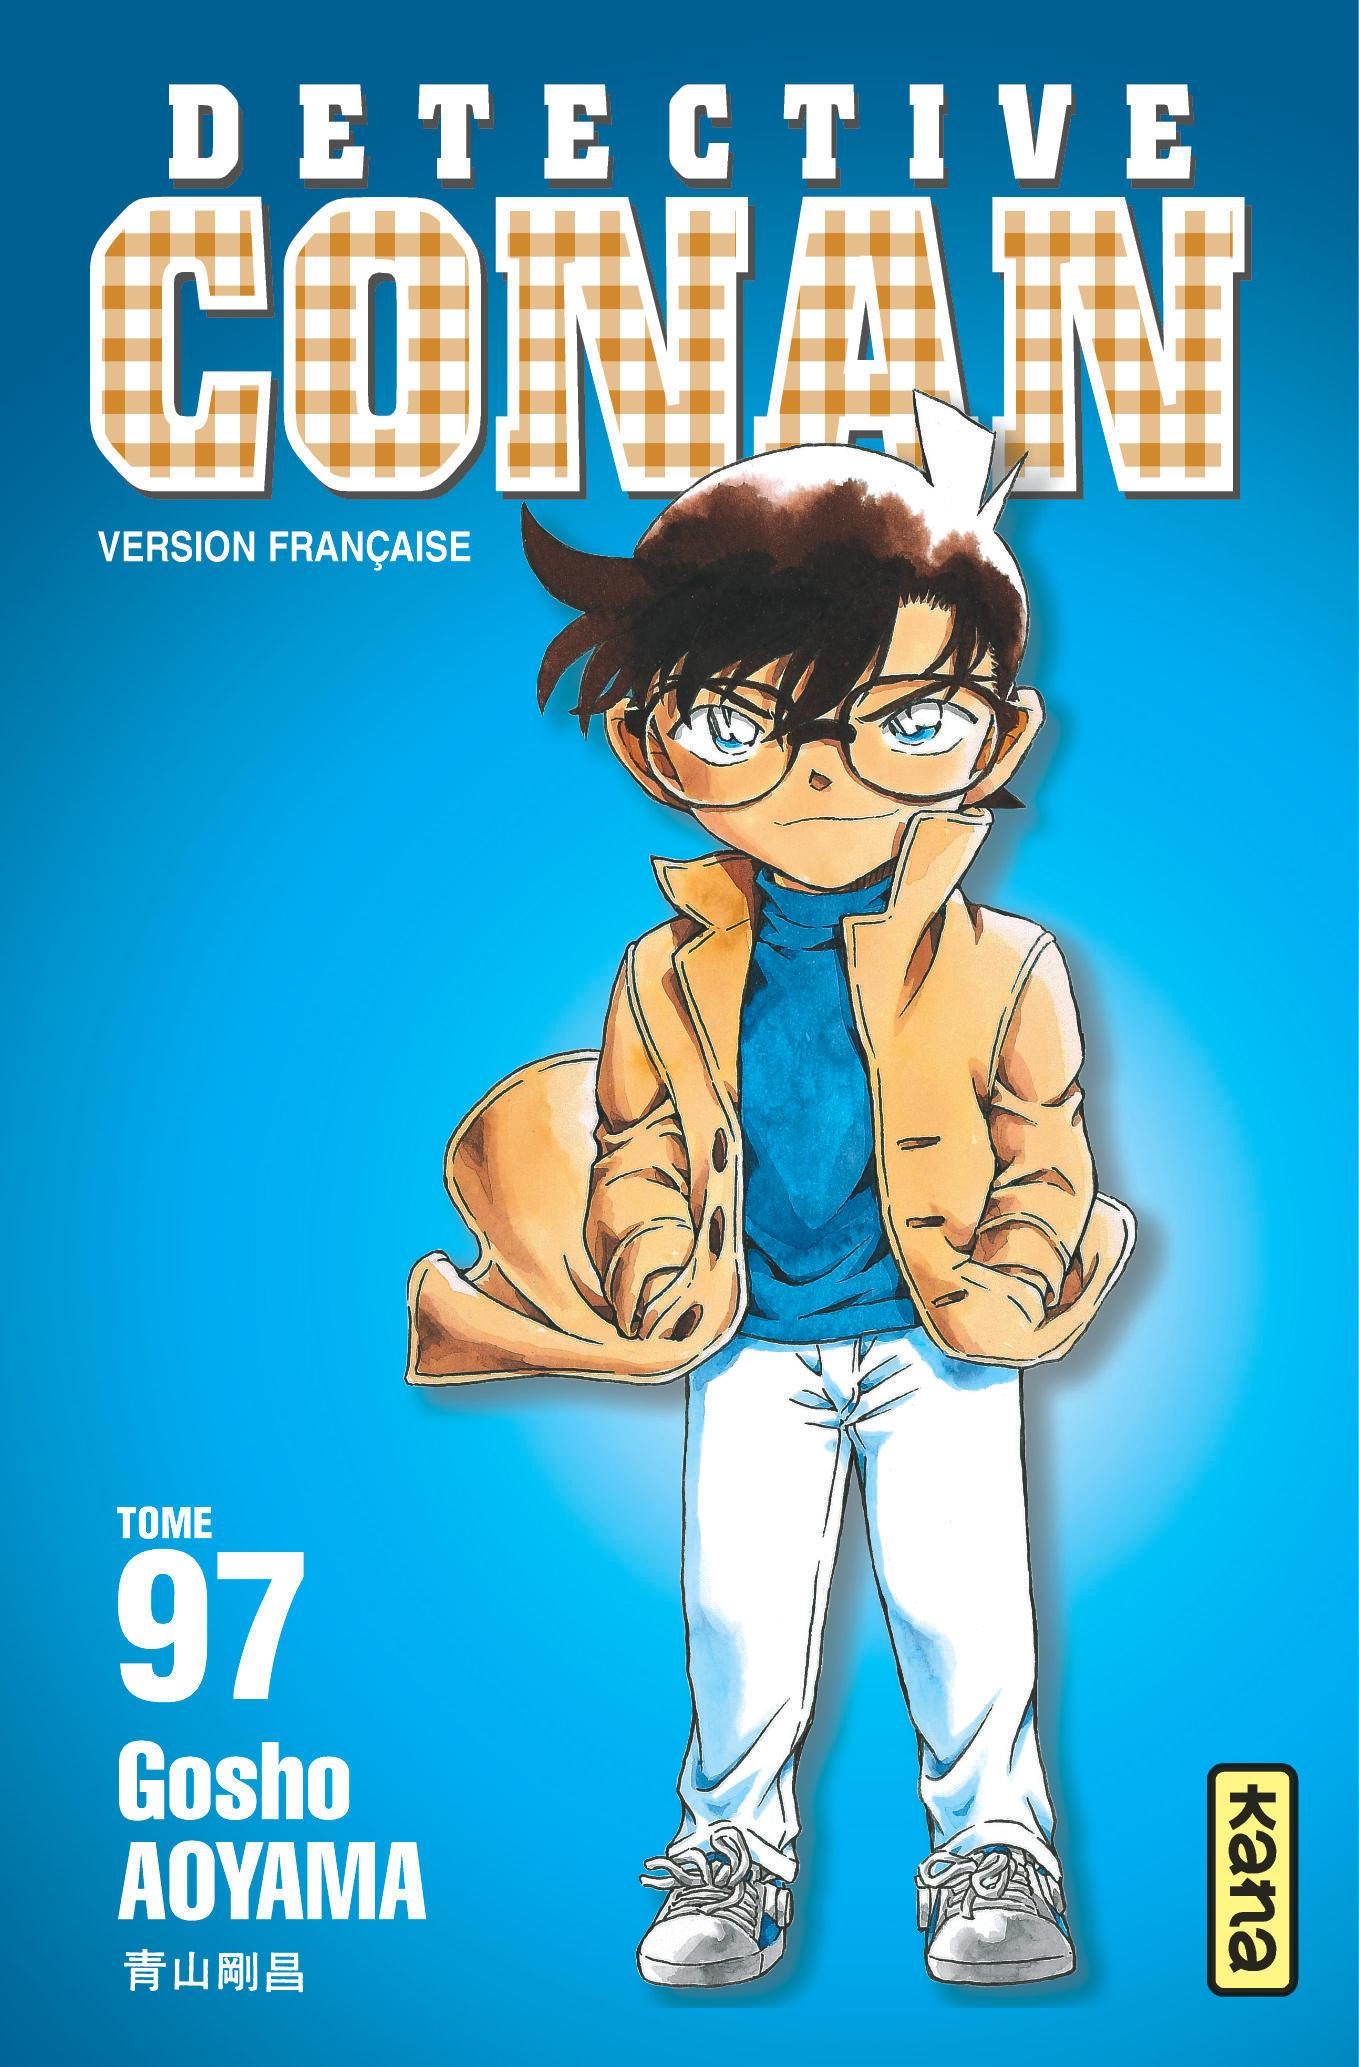 DETECTIVE CONAN - TOME 97